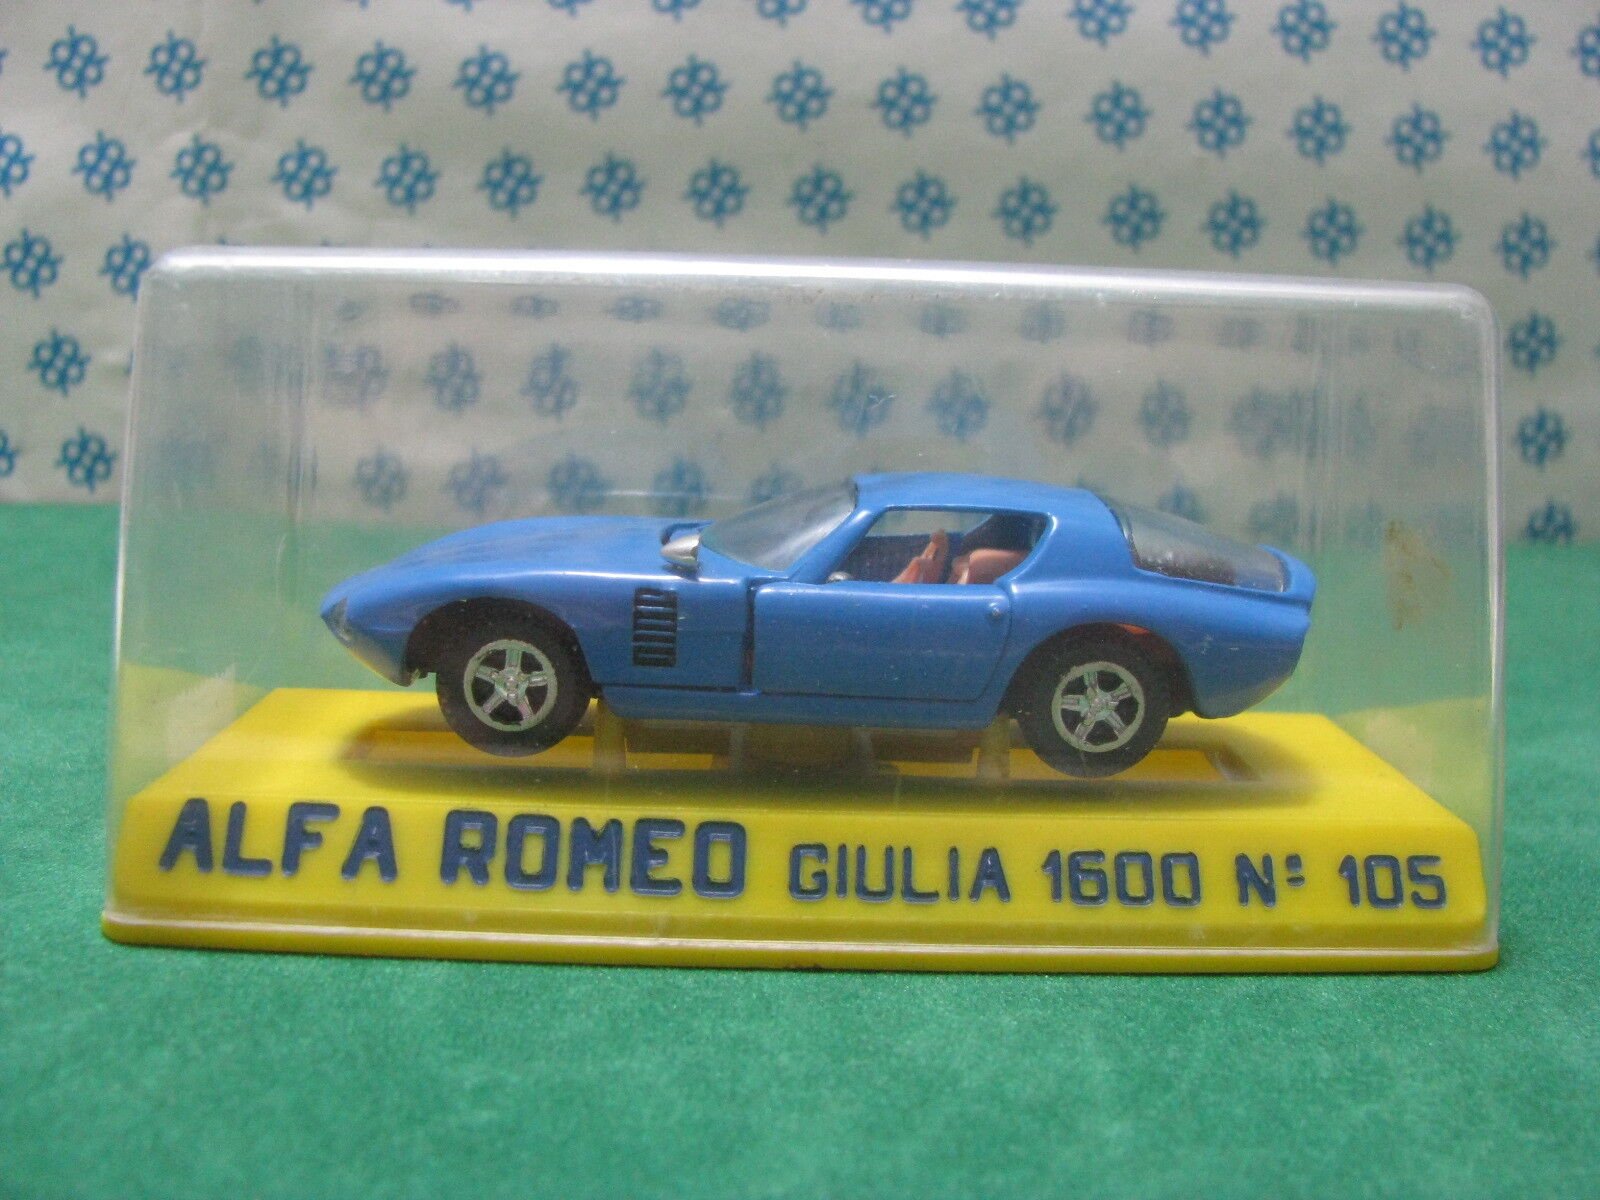 Vintage-Alfa Romeo Giulia Canguro 1600cc. - 1 43 Joal Nº 105 MIB